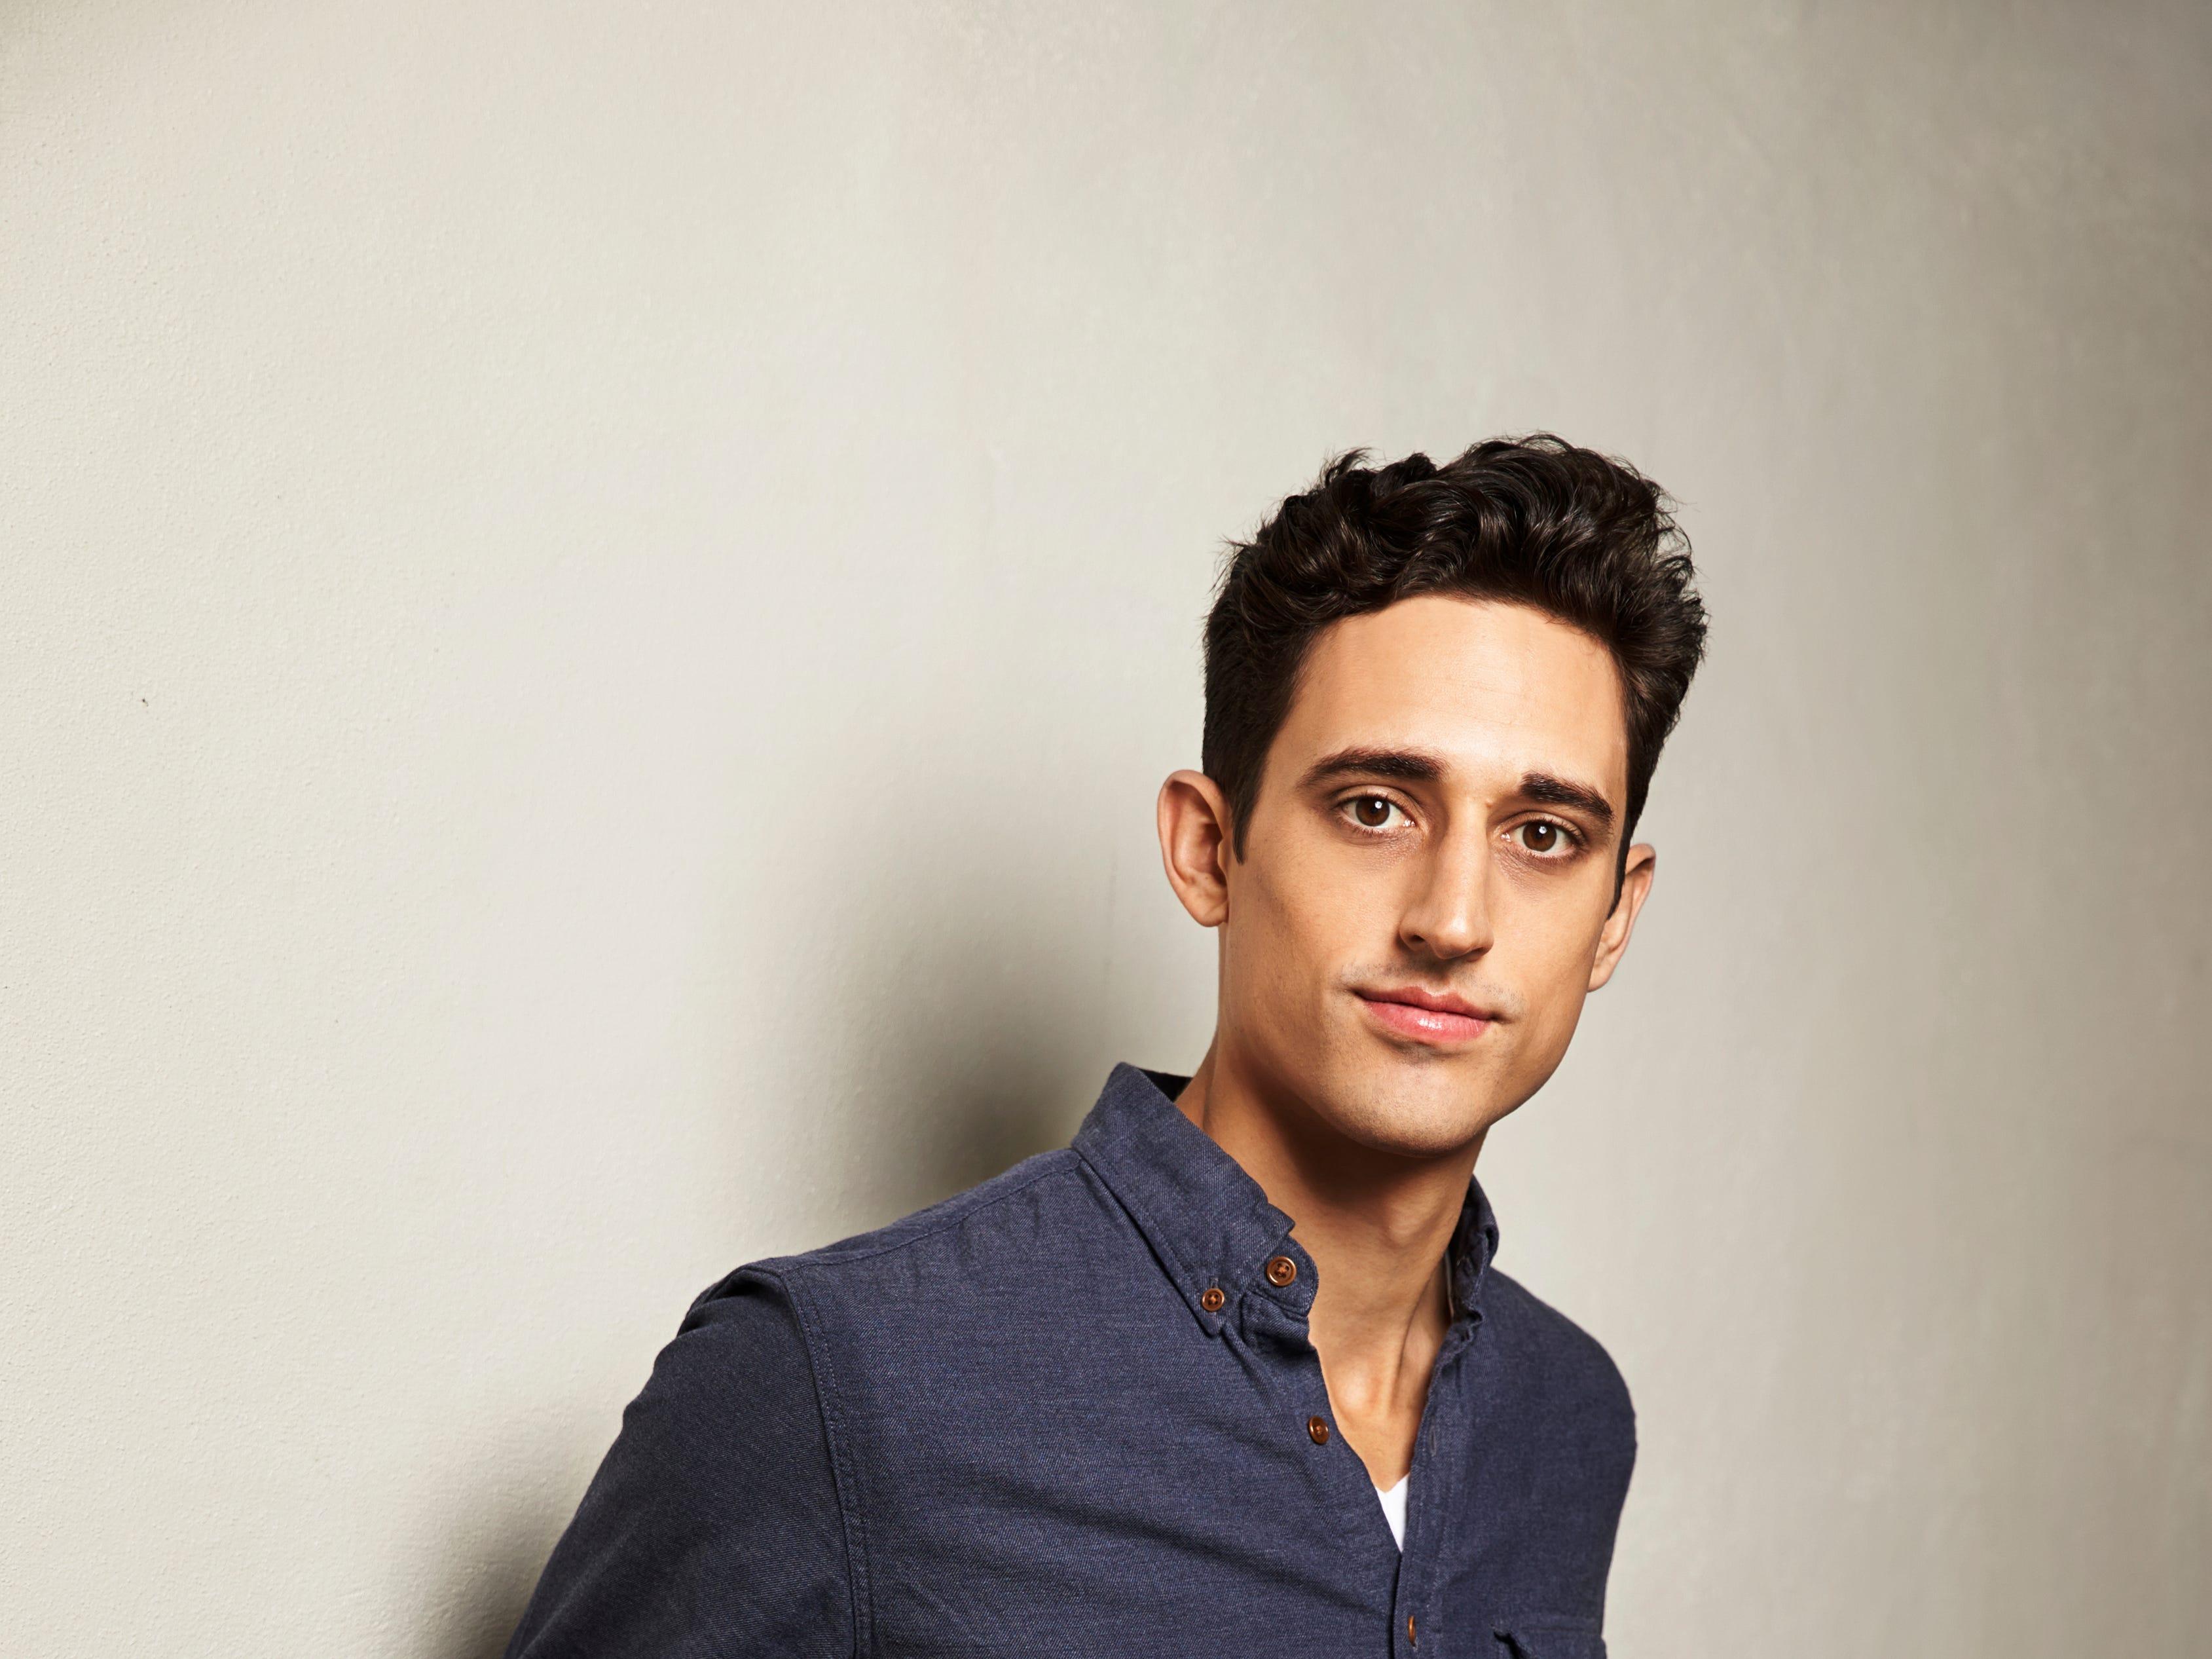 Justin Peck, choreographer for the Instagram generation, brings signature piece to Ballet Arizona